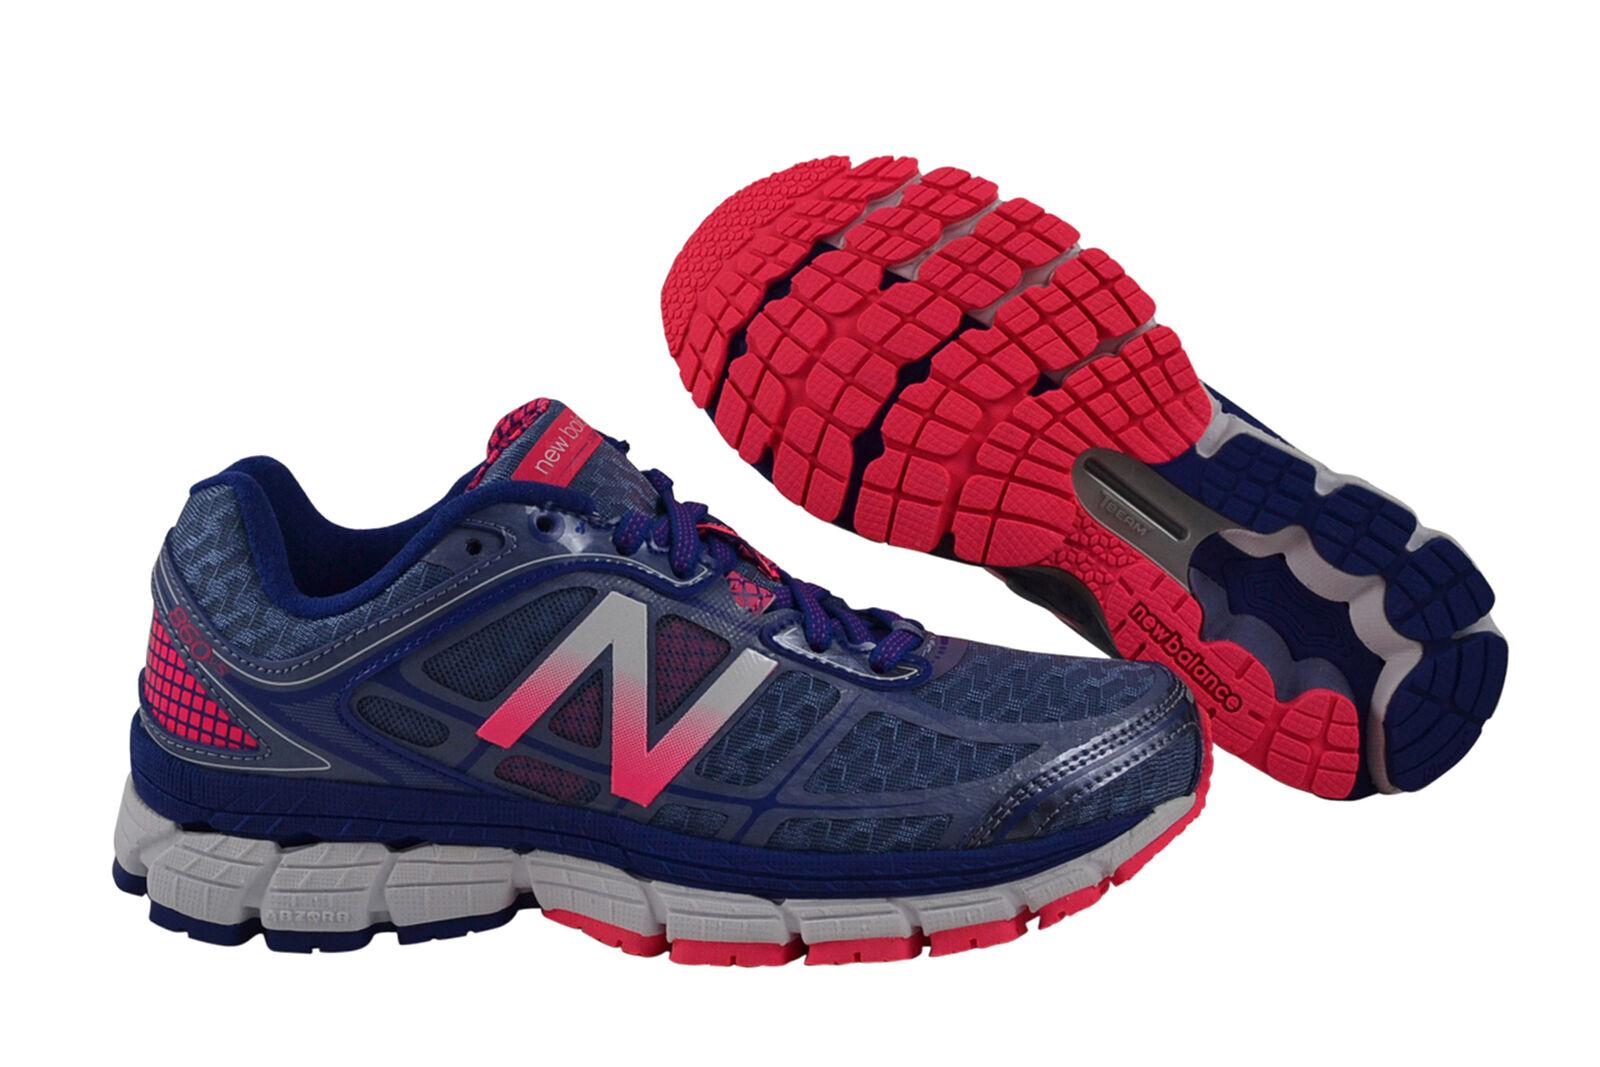 New balance w860 gp5 B v5 azul rosa blanco blanco blanco zapatos zapatillas 83f147